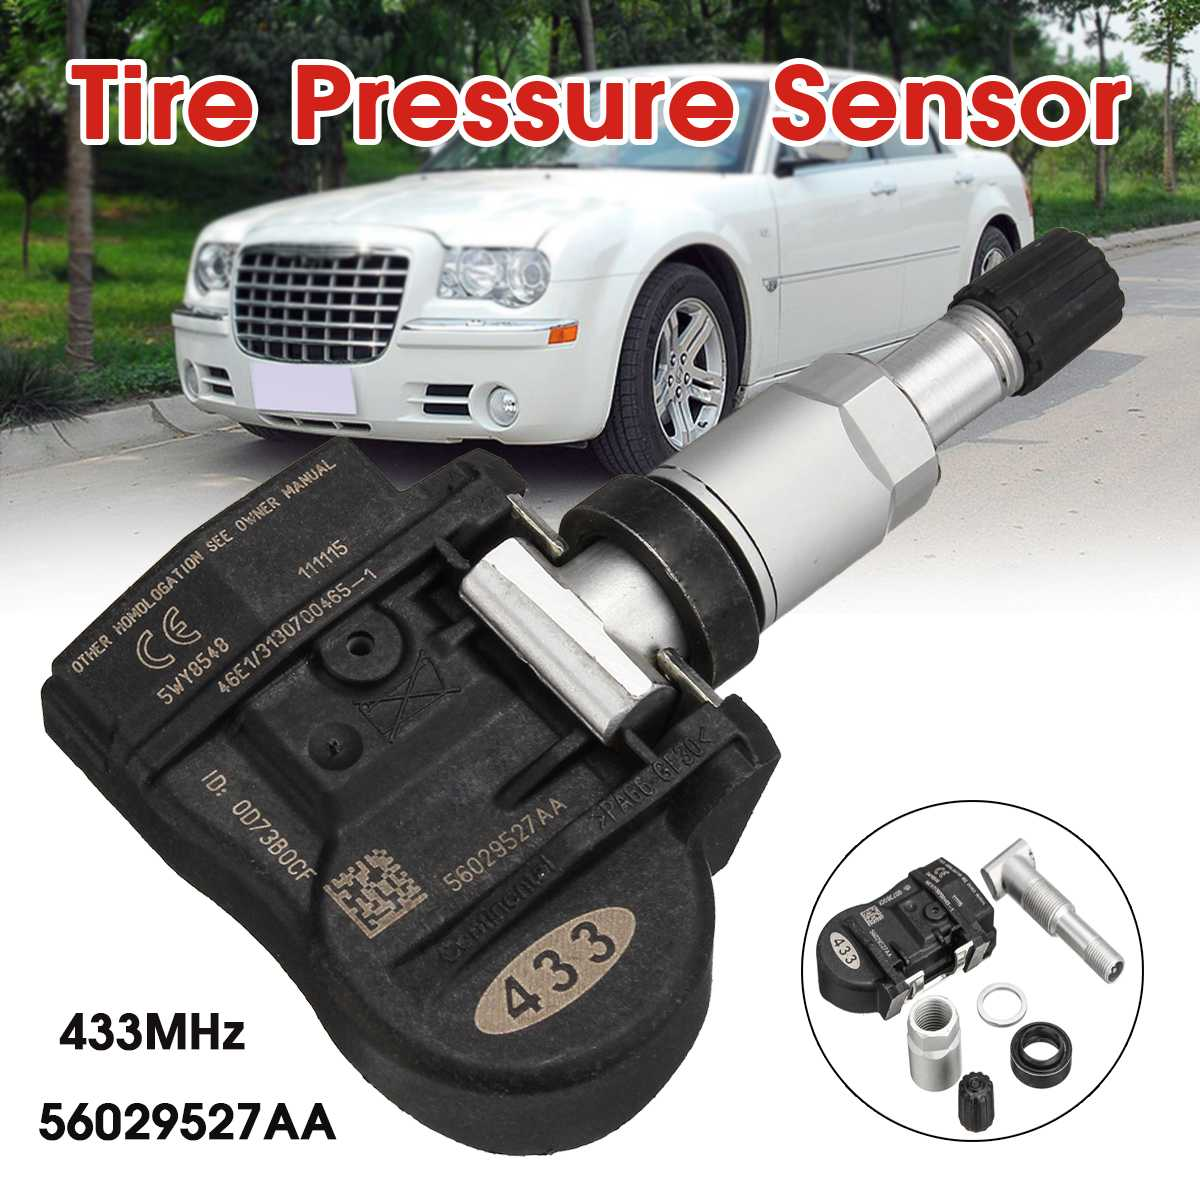 56029527AA Tire Pressure Monitoring System Sensor  Tire Pressure Sensor 433MHz For Chrysler 200 300 For Dodge 68078768AA